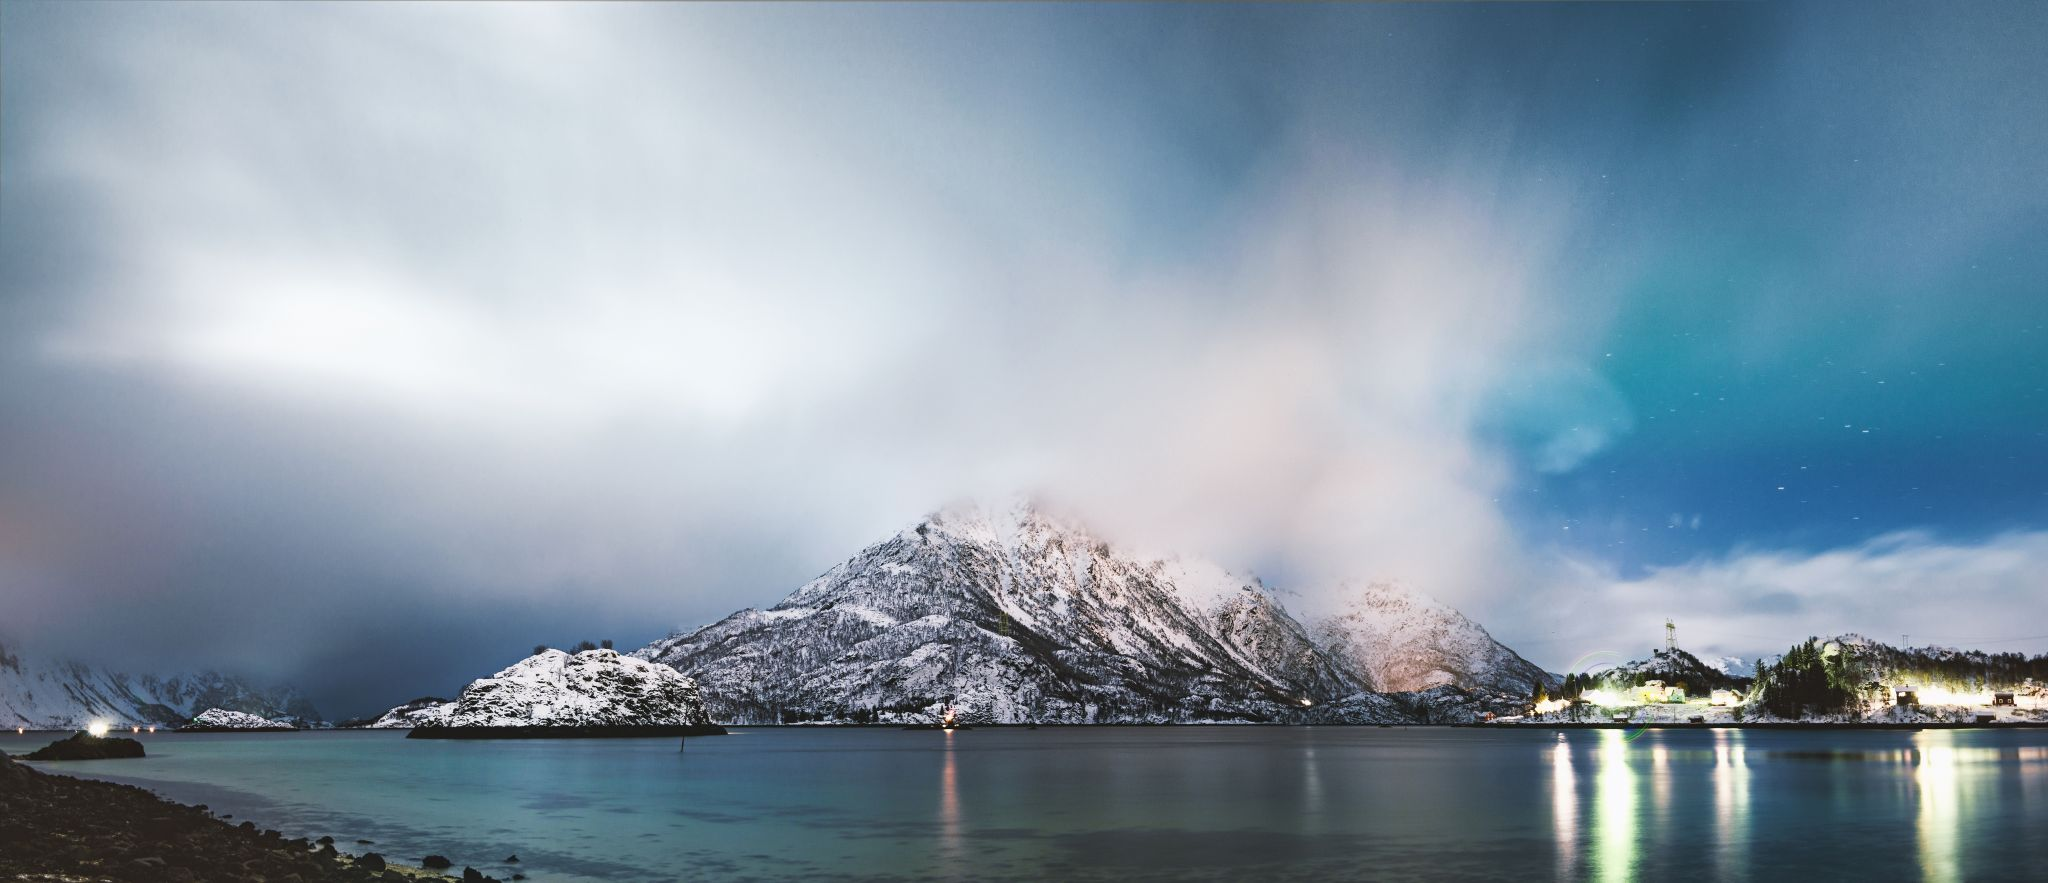 Hanøy, Norway